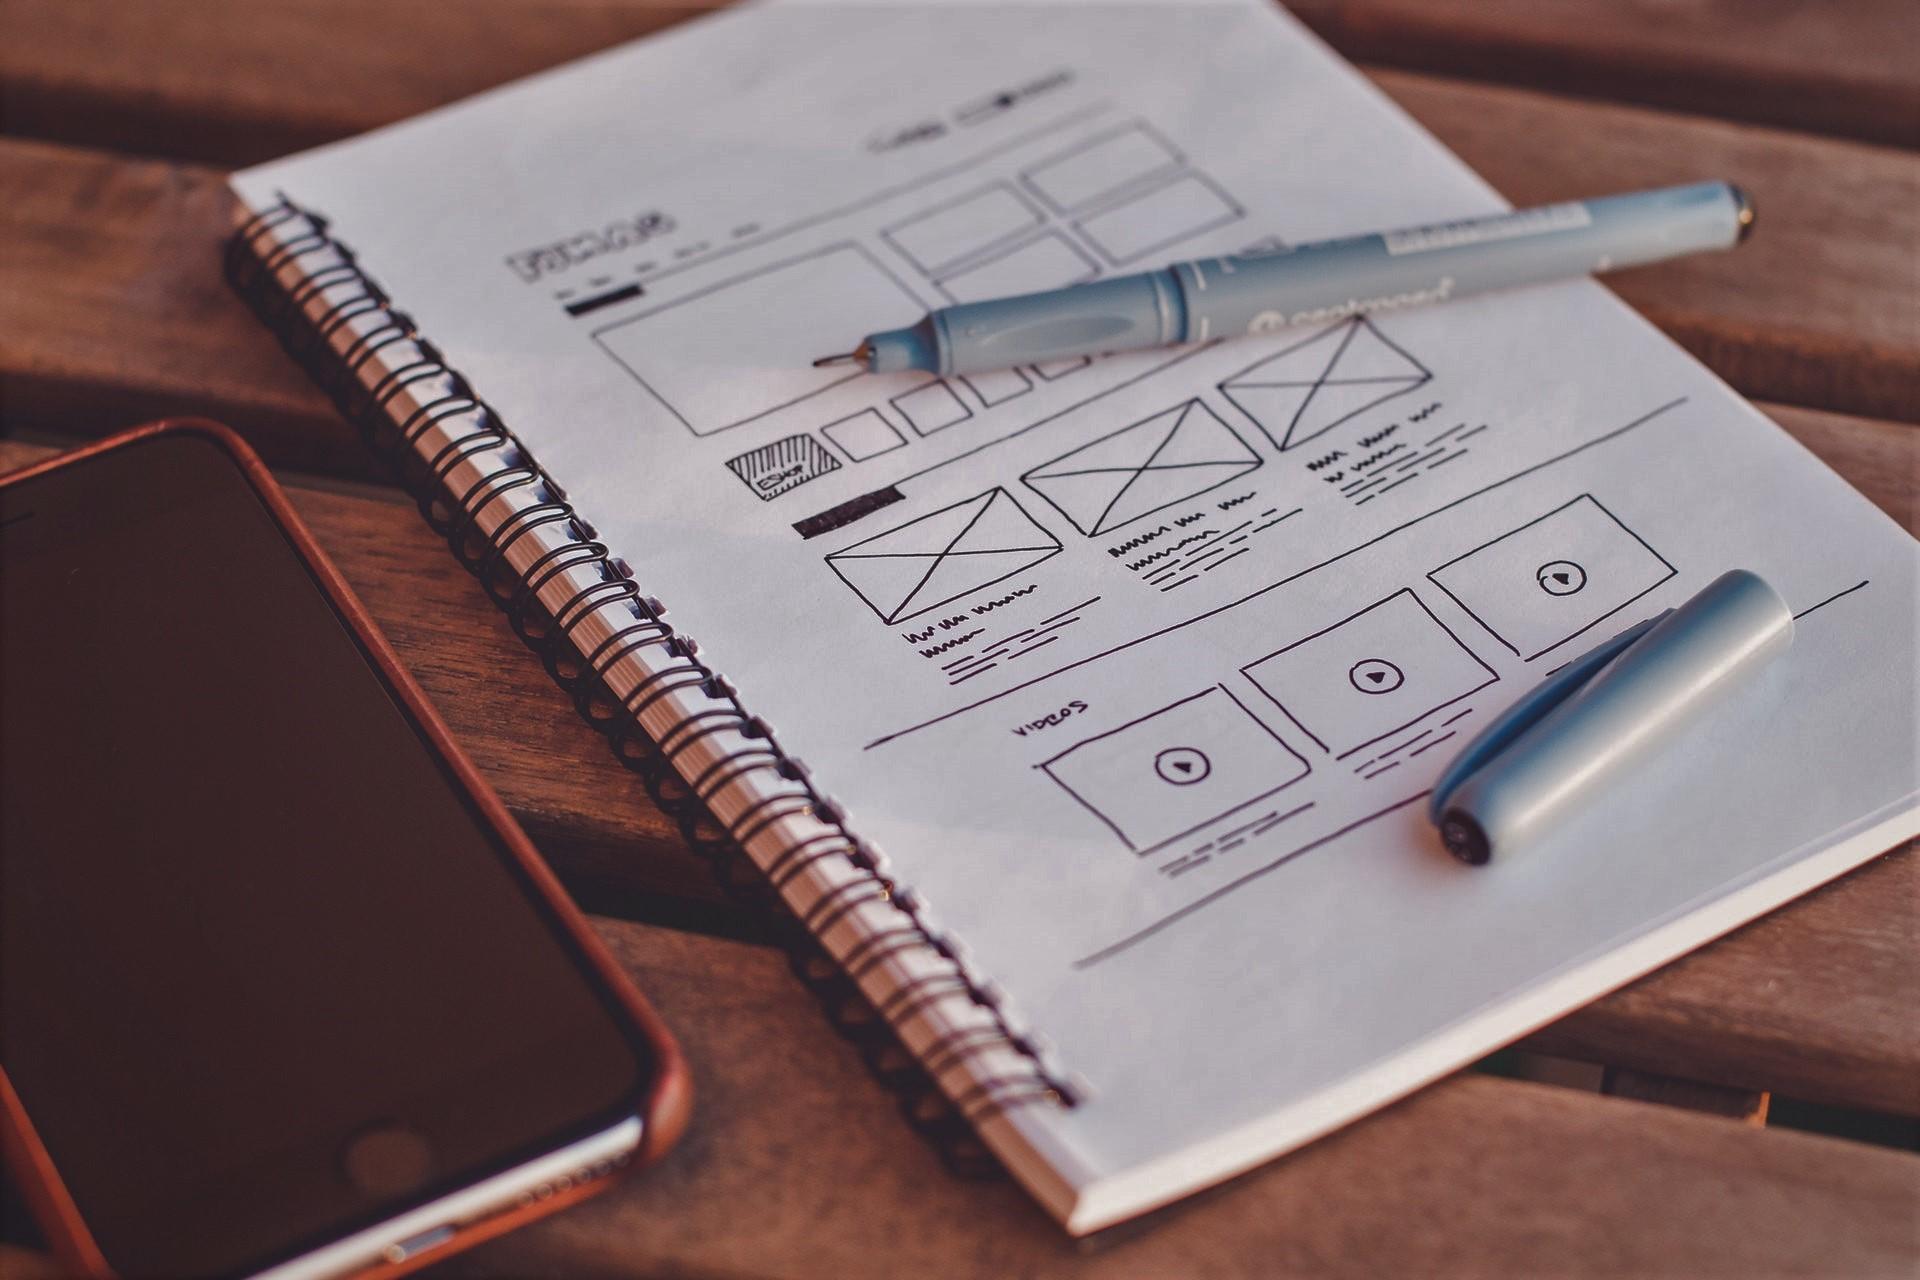 The Four Non-Coding Website Platforms